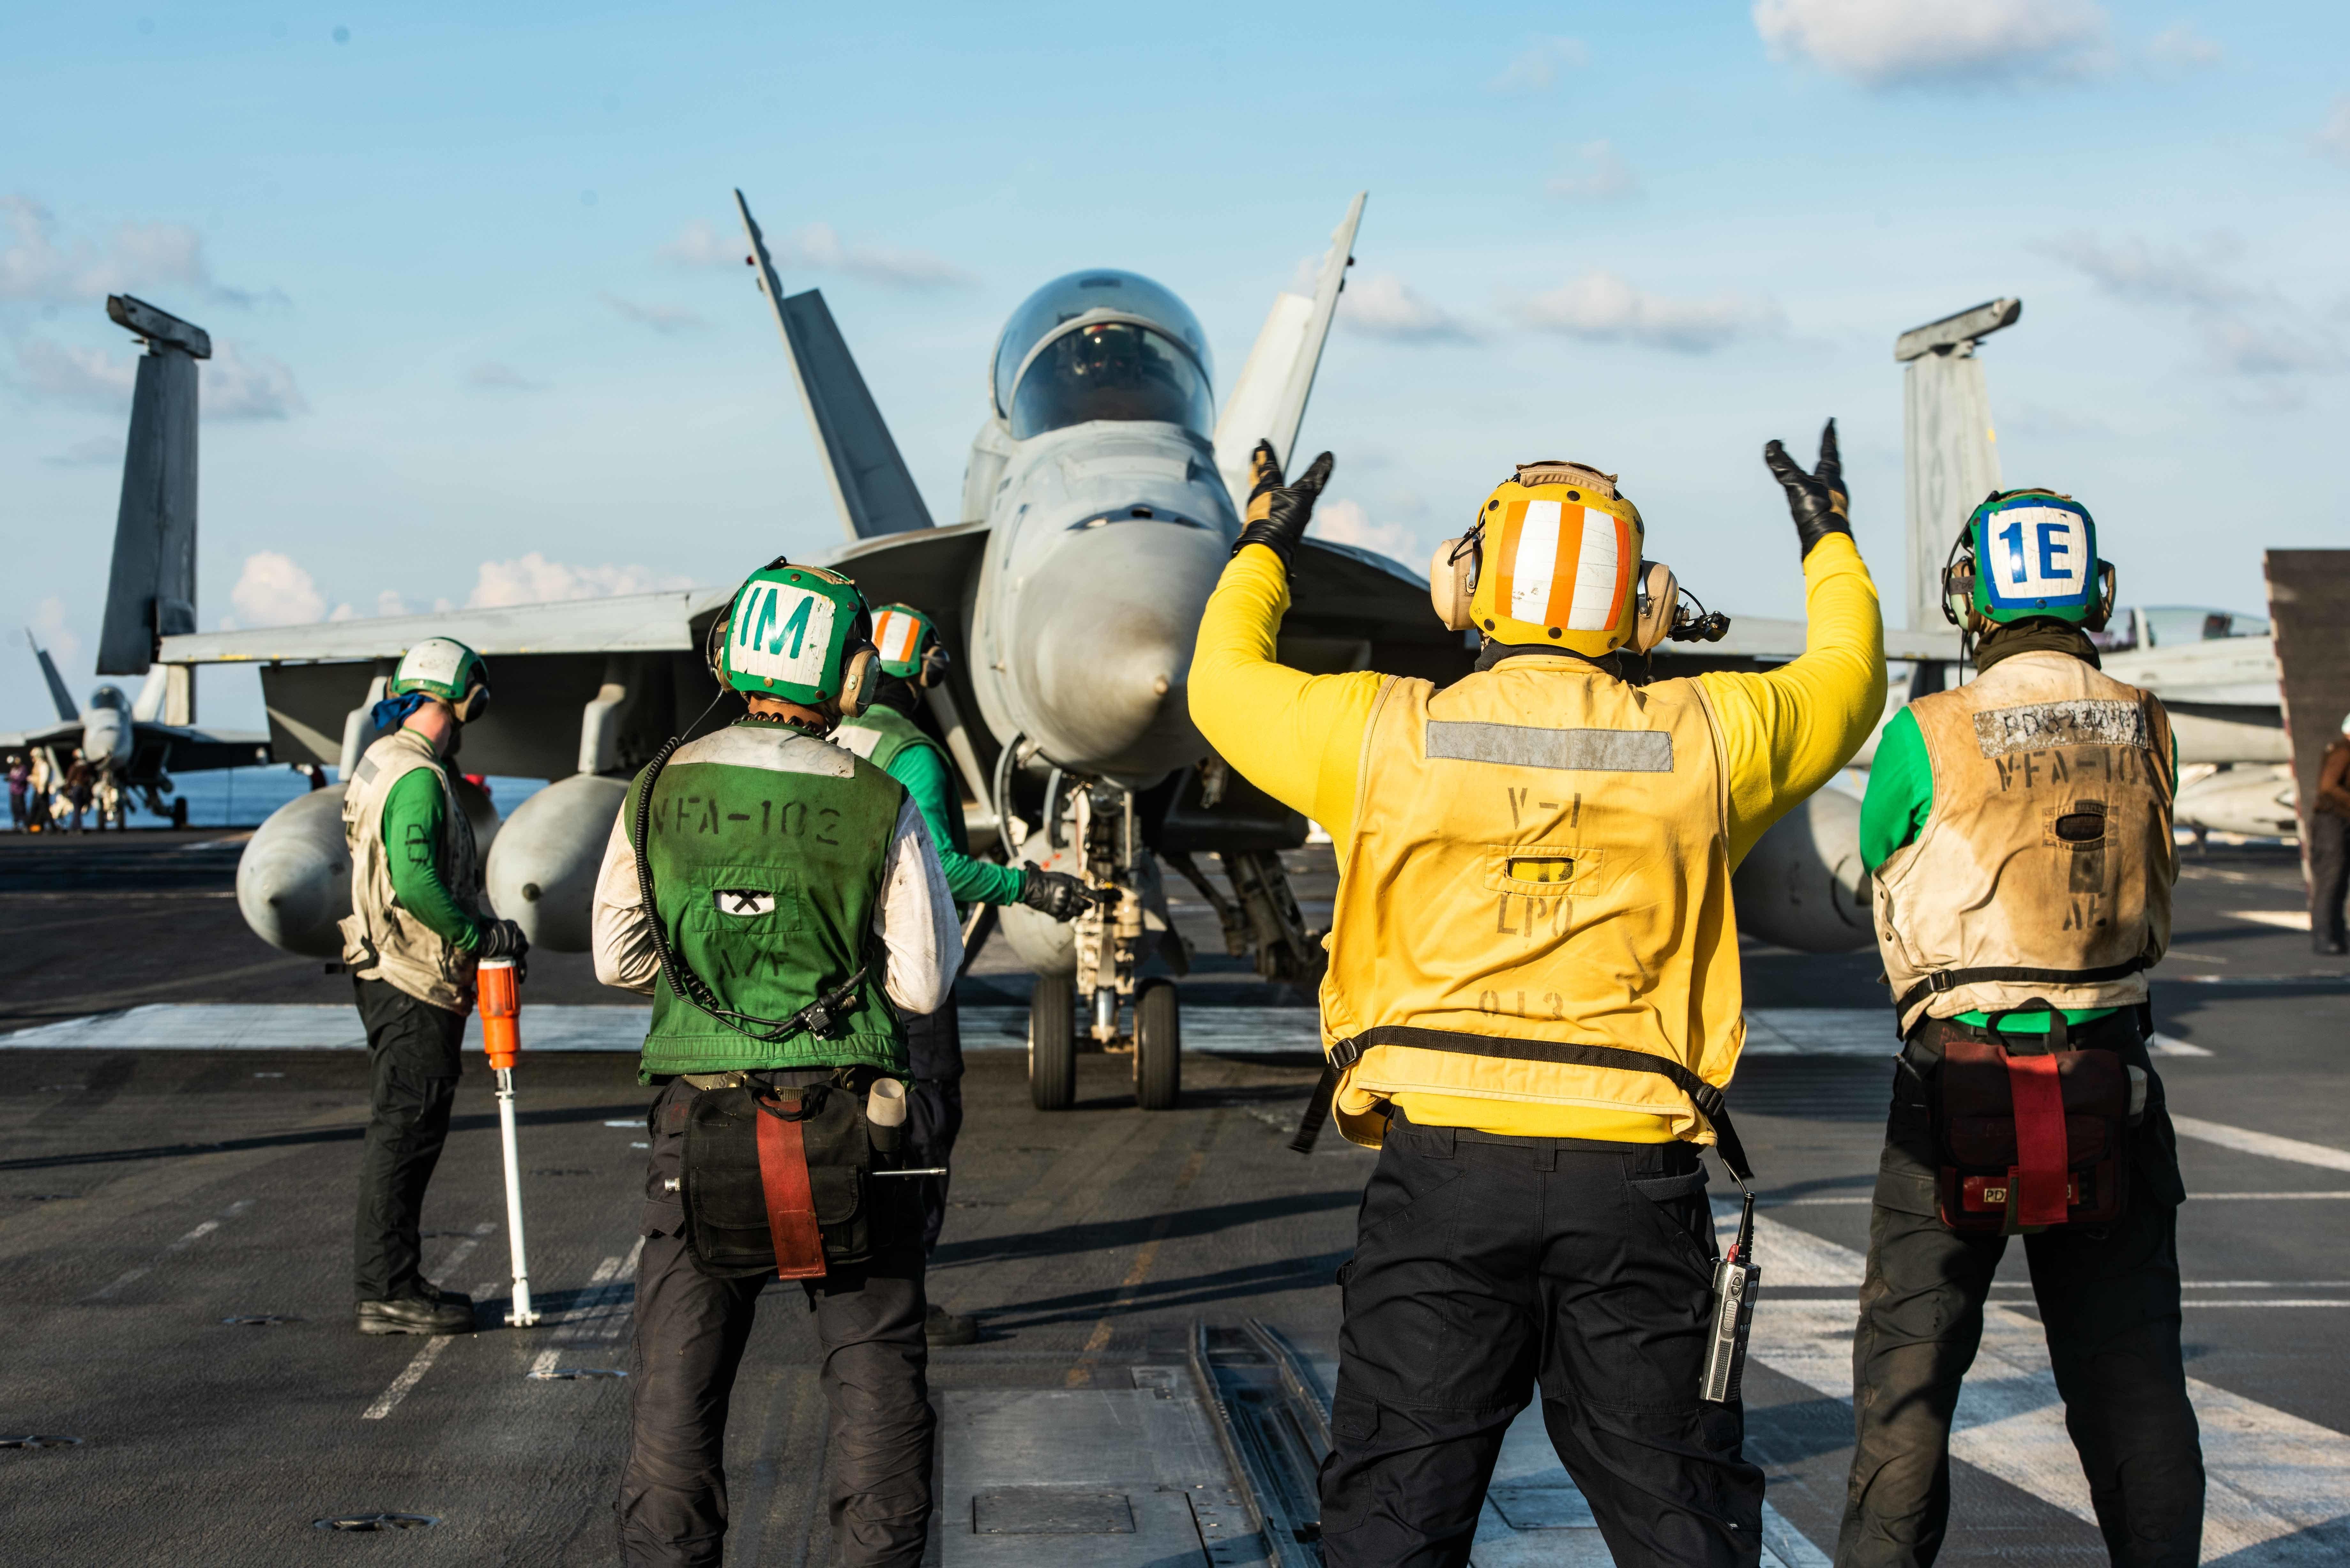 USNI News Fleet and Marine Tracker: June 24, 2019